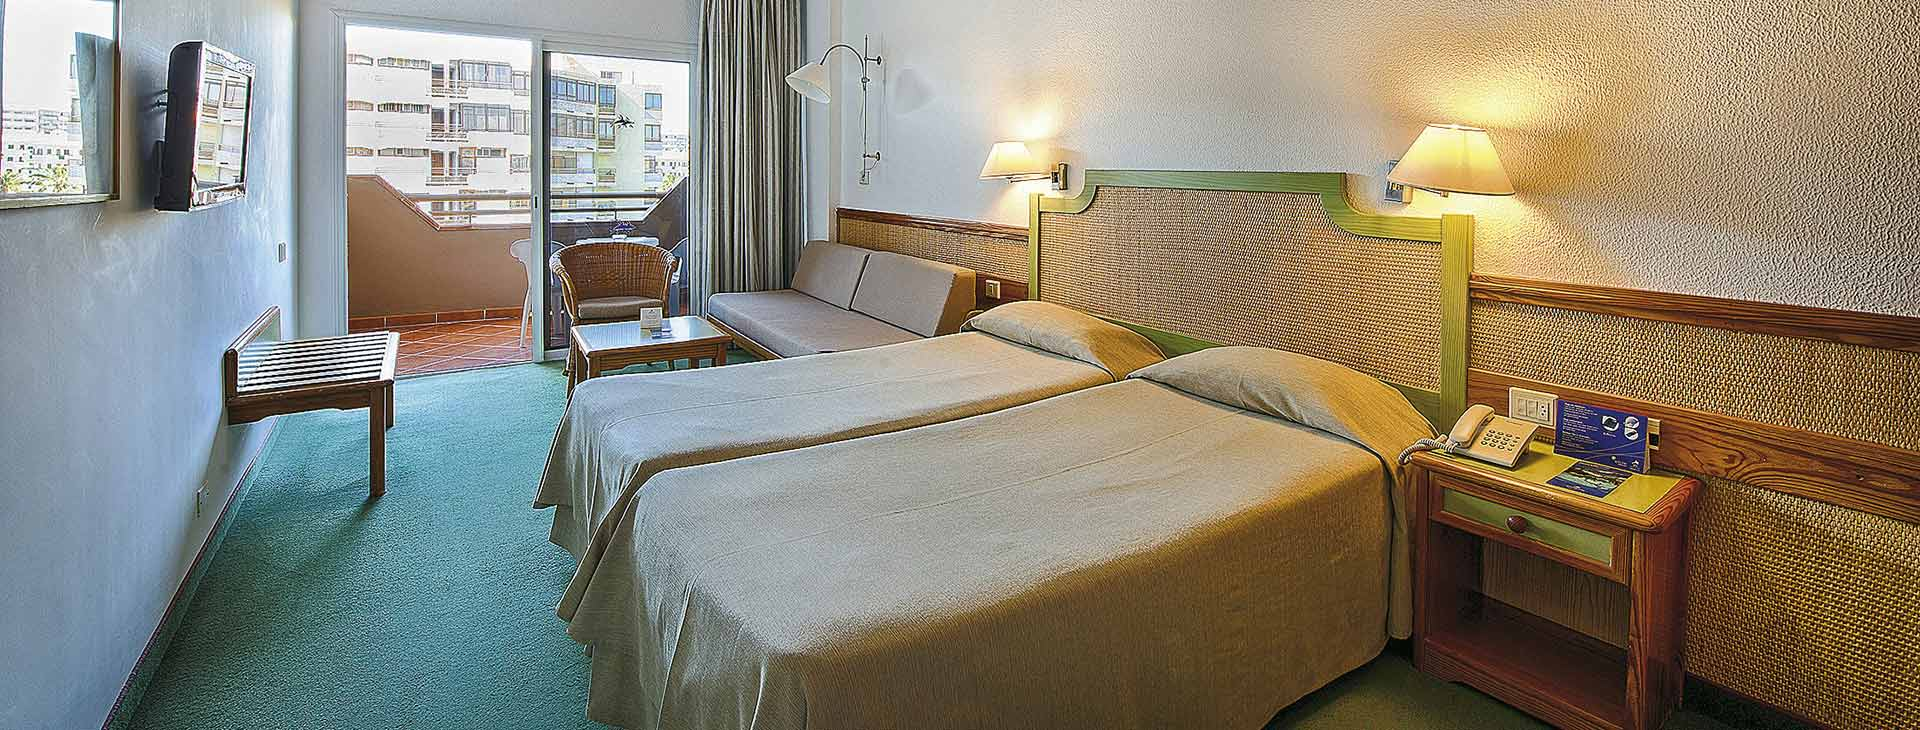 55a9e9b7ca88b Hotel ifa continental playa del ingles fotos